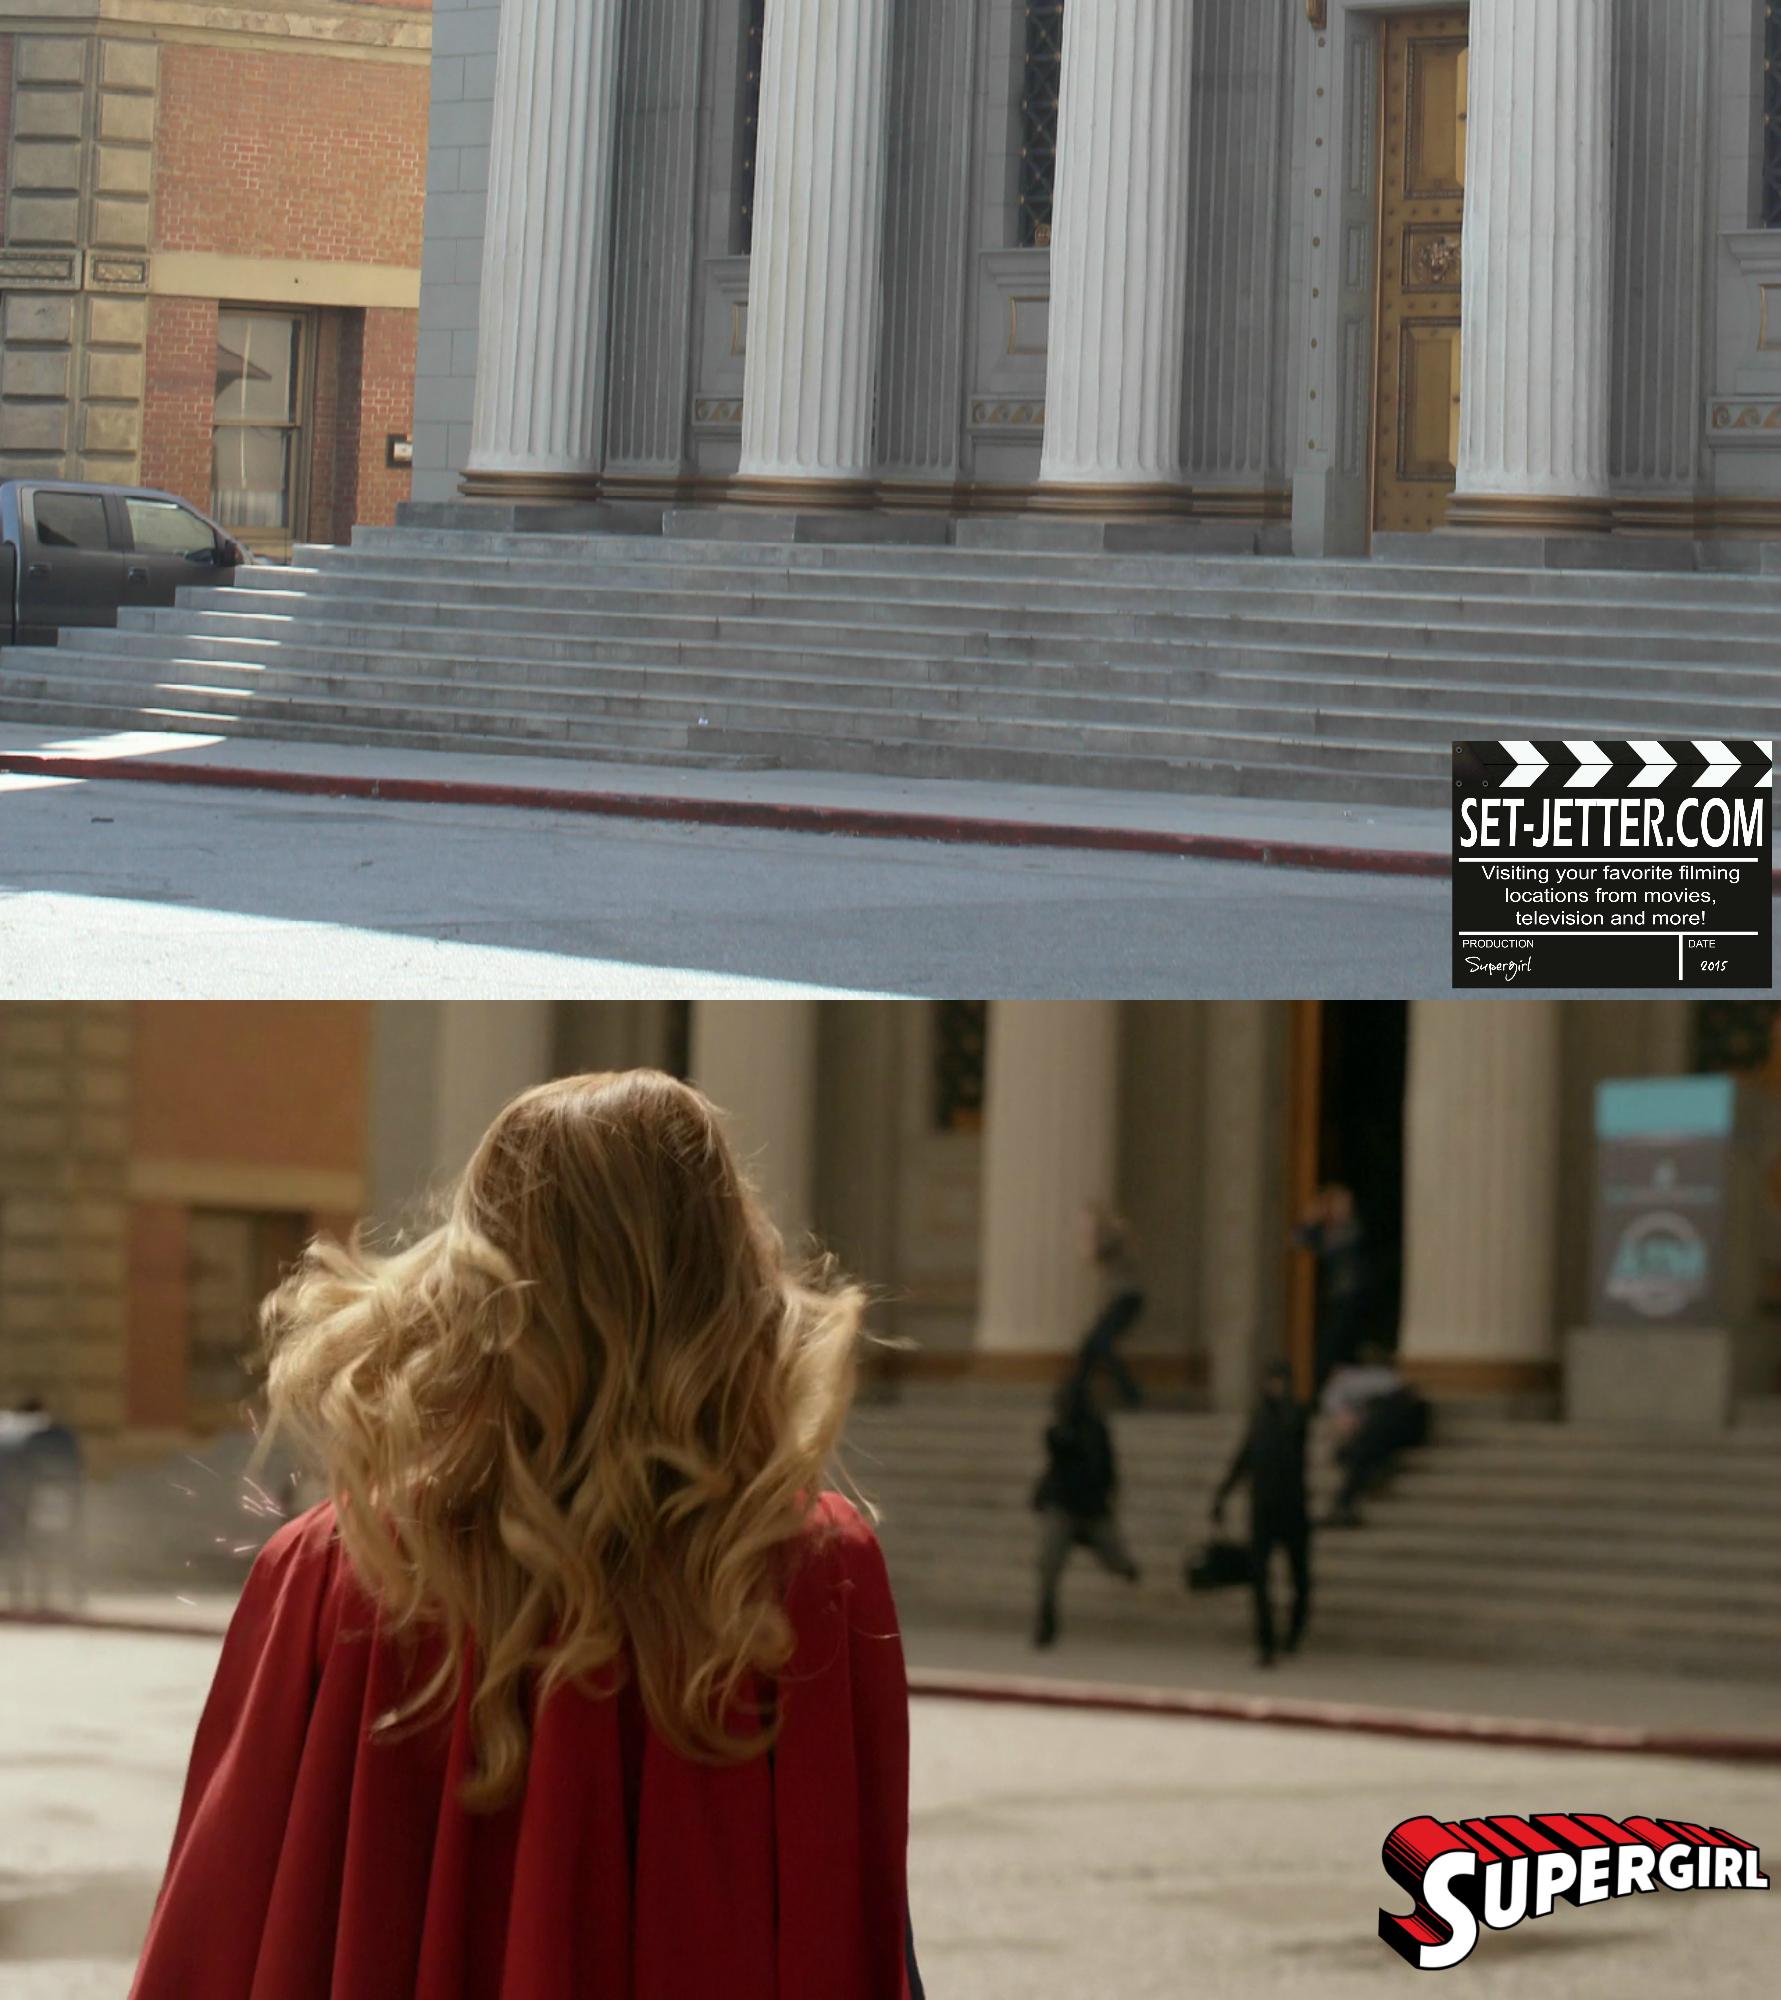 Supergirl comparison 23.jpg